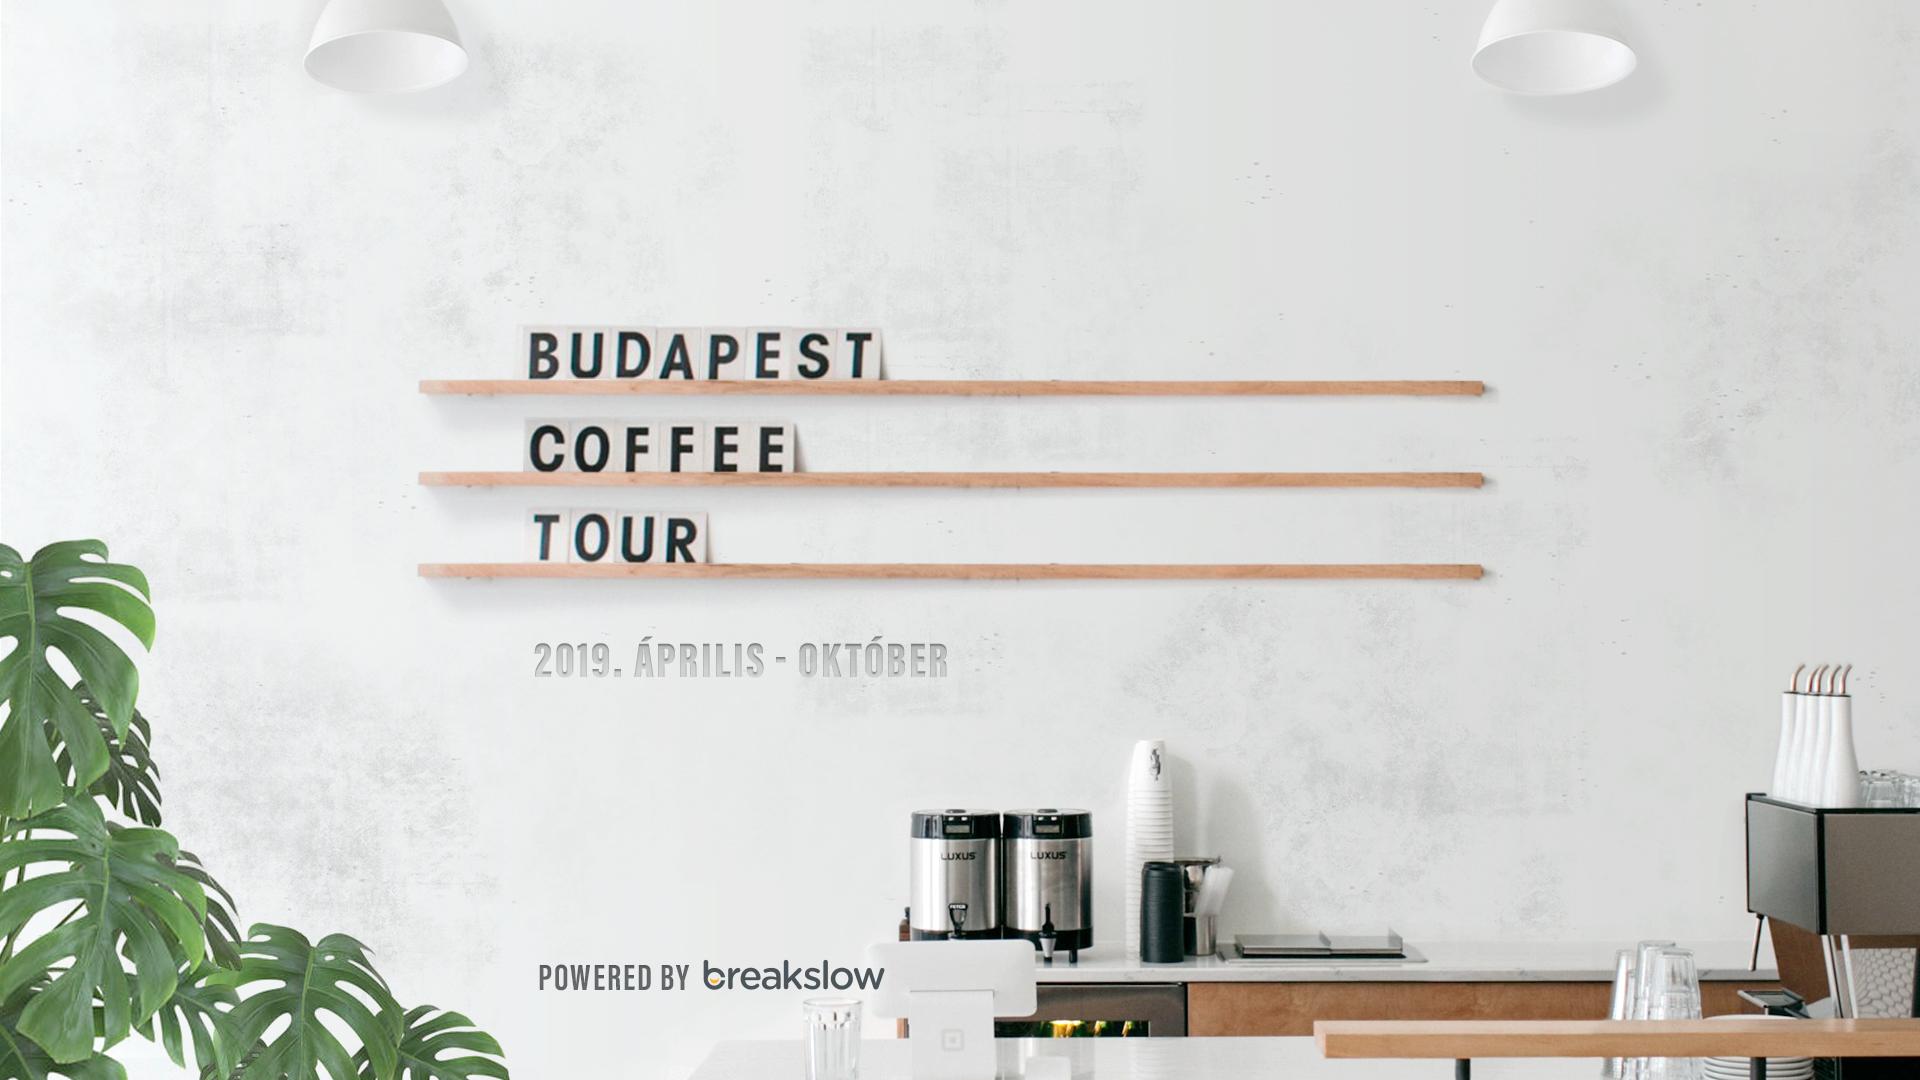 budapest_coffee_tour.jpg